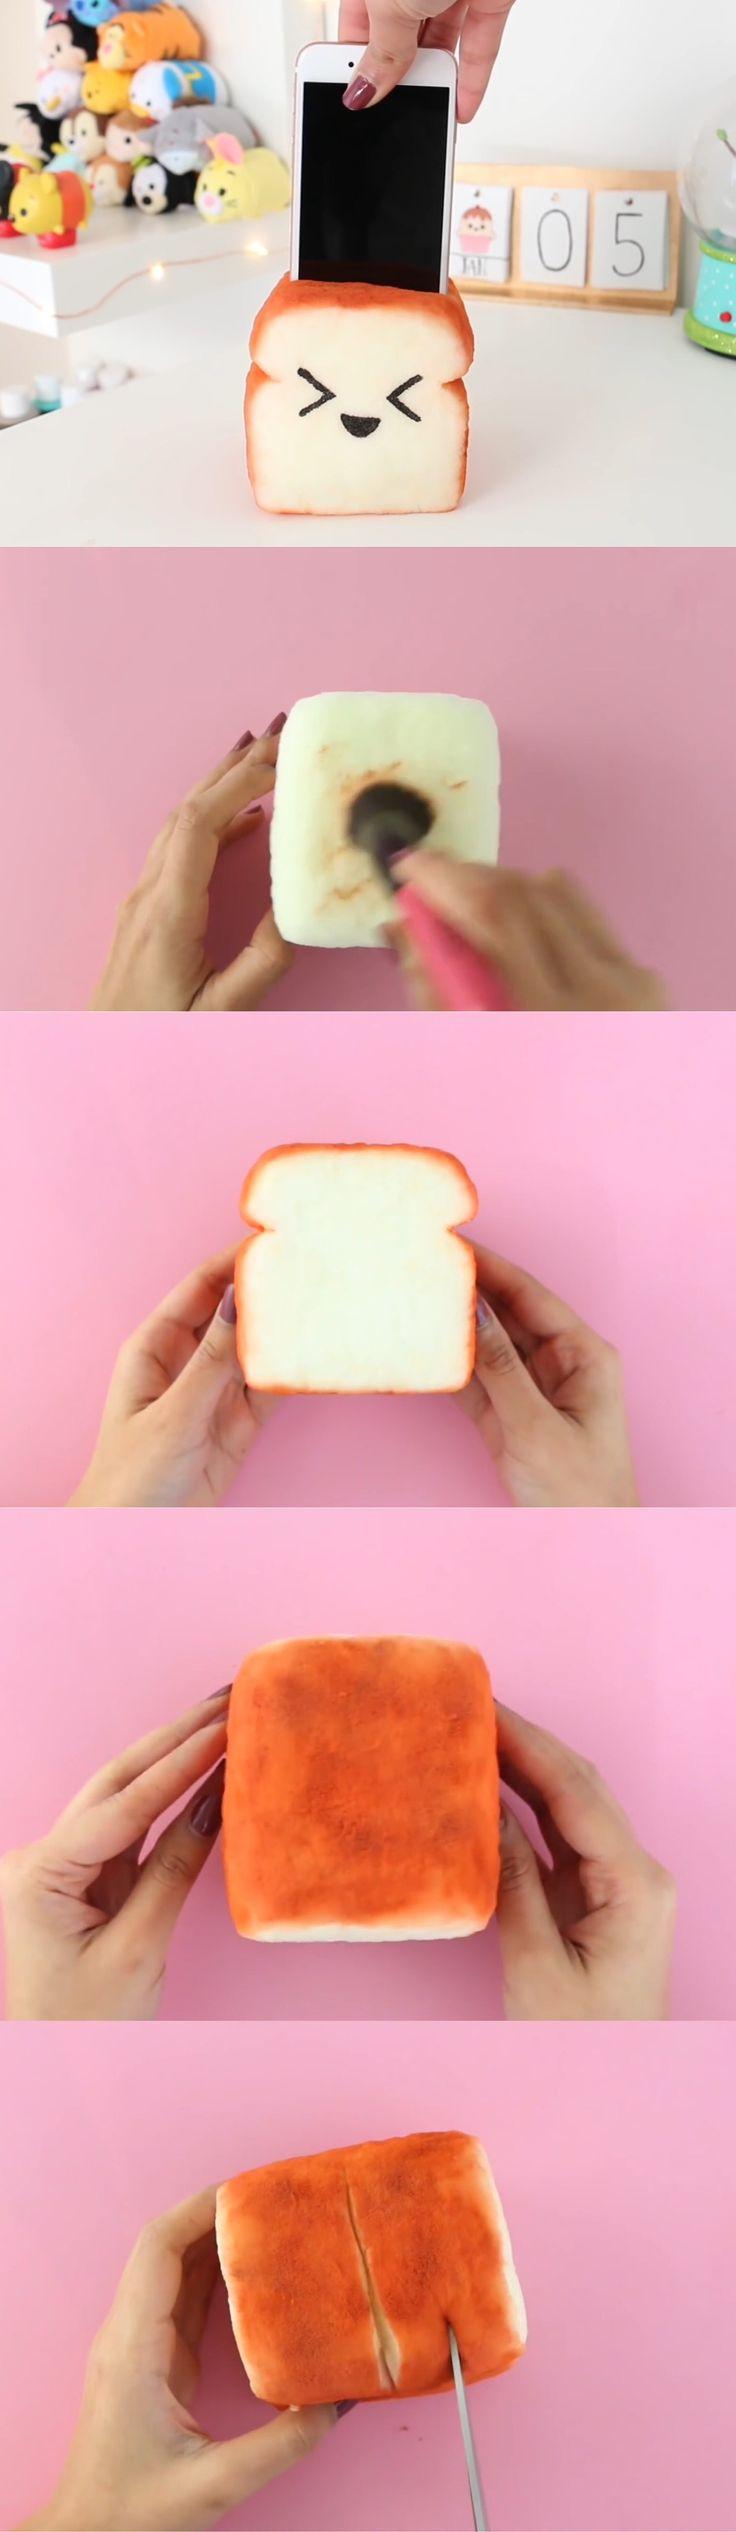 Toast Squishy/Phone holder Part 3|Nim C